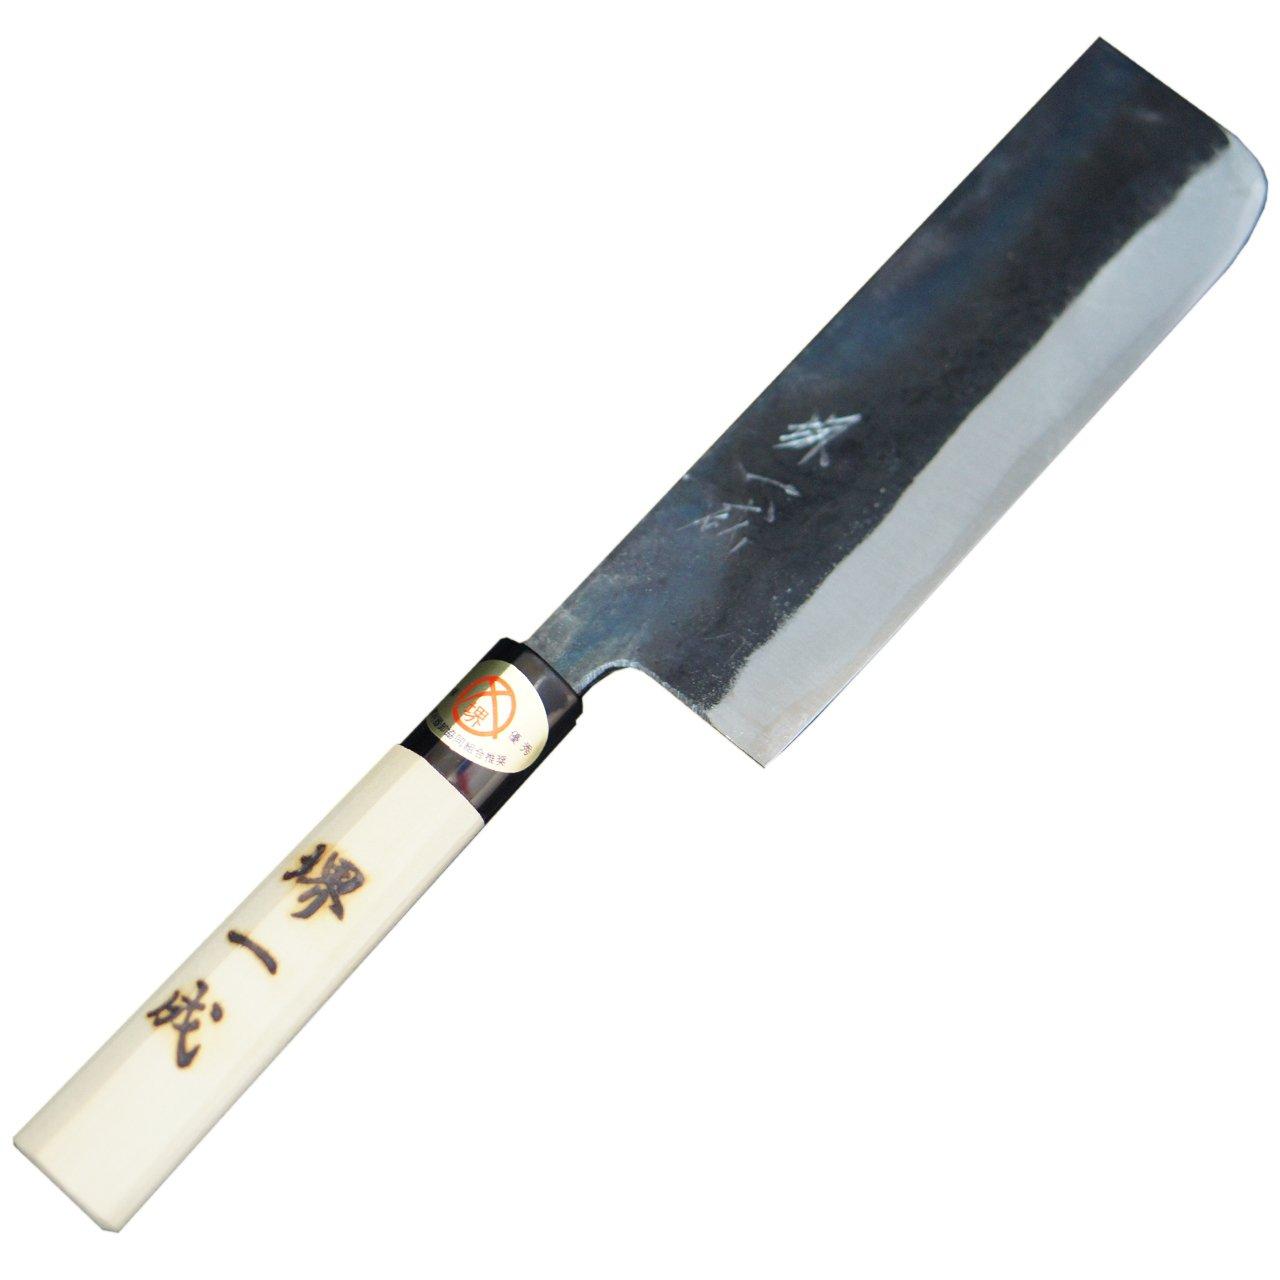 [Japan Made] Hocho: for cutting vegetables Japanese Nakiri knife 165mm(6.5in) custom shop made